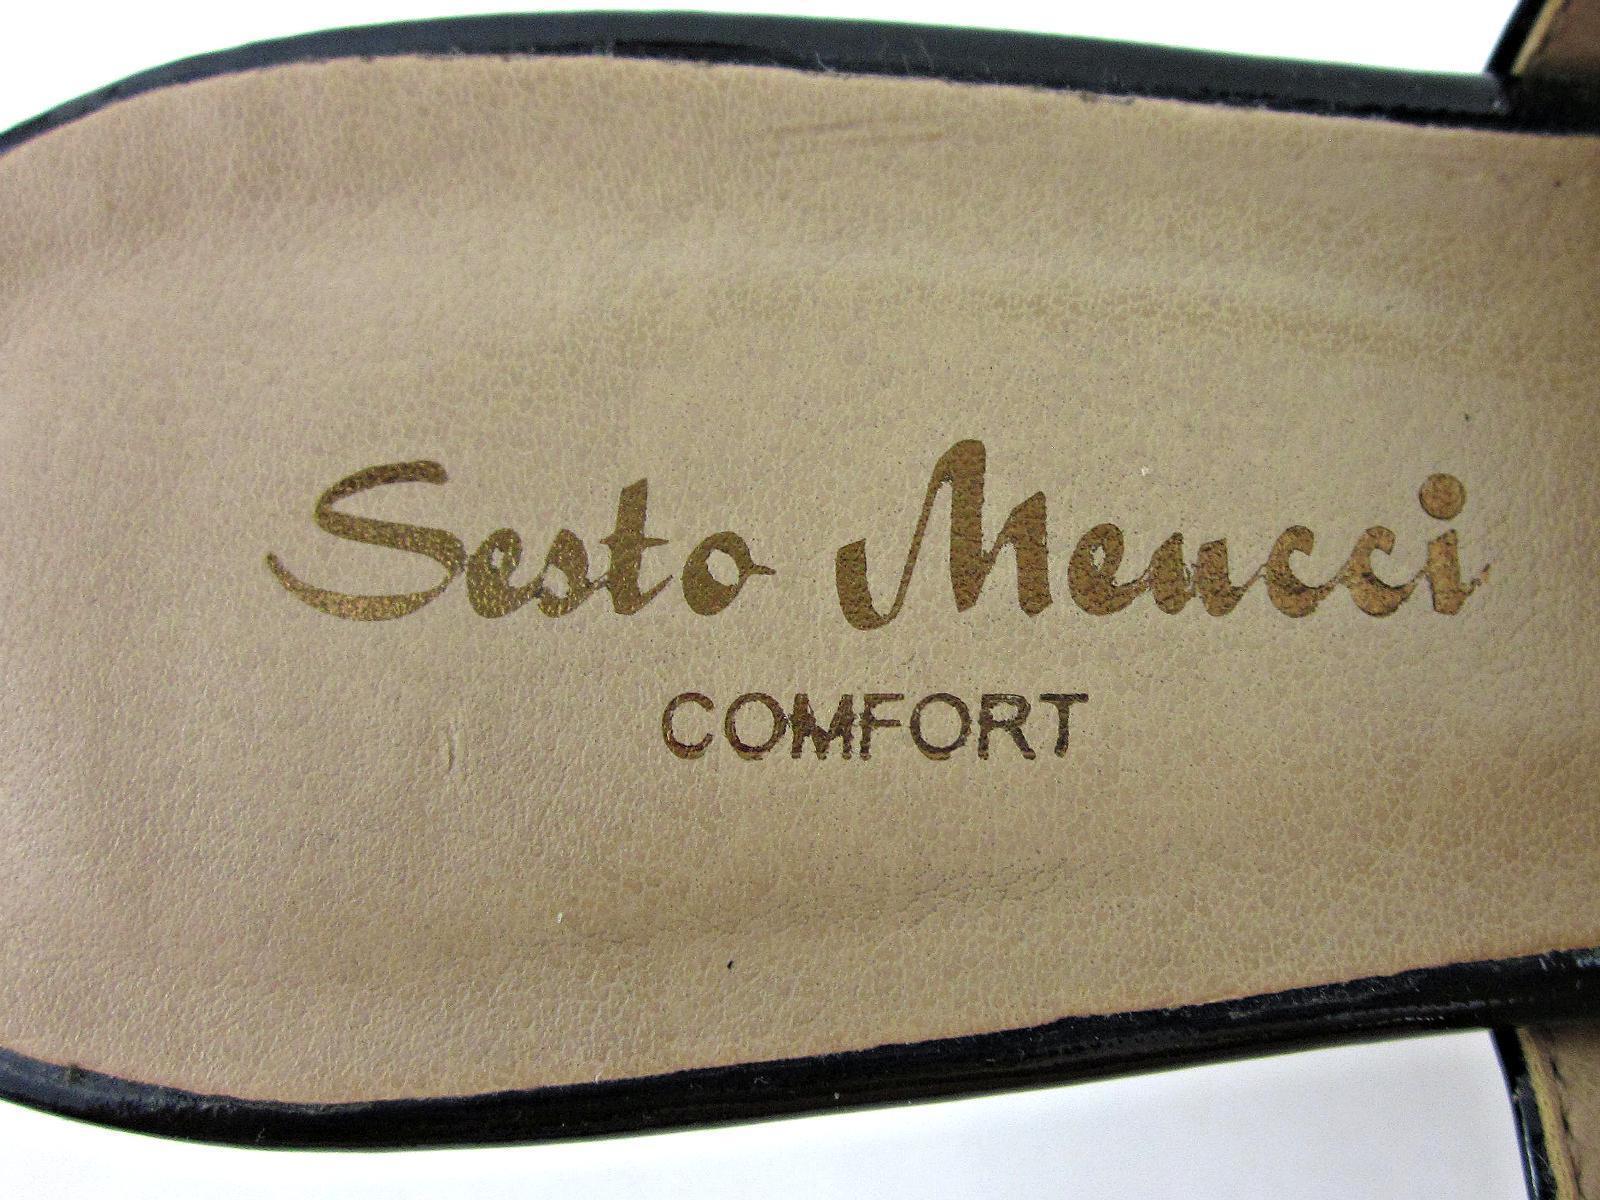 Sesto Meucci Confort Sandalias Punta Abierta Charol Sandalias Confort De Taco Bajo Negro Patente Talla 8M 857b23